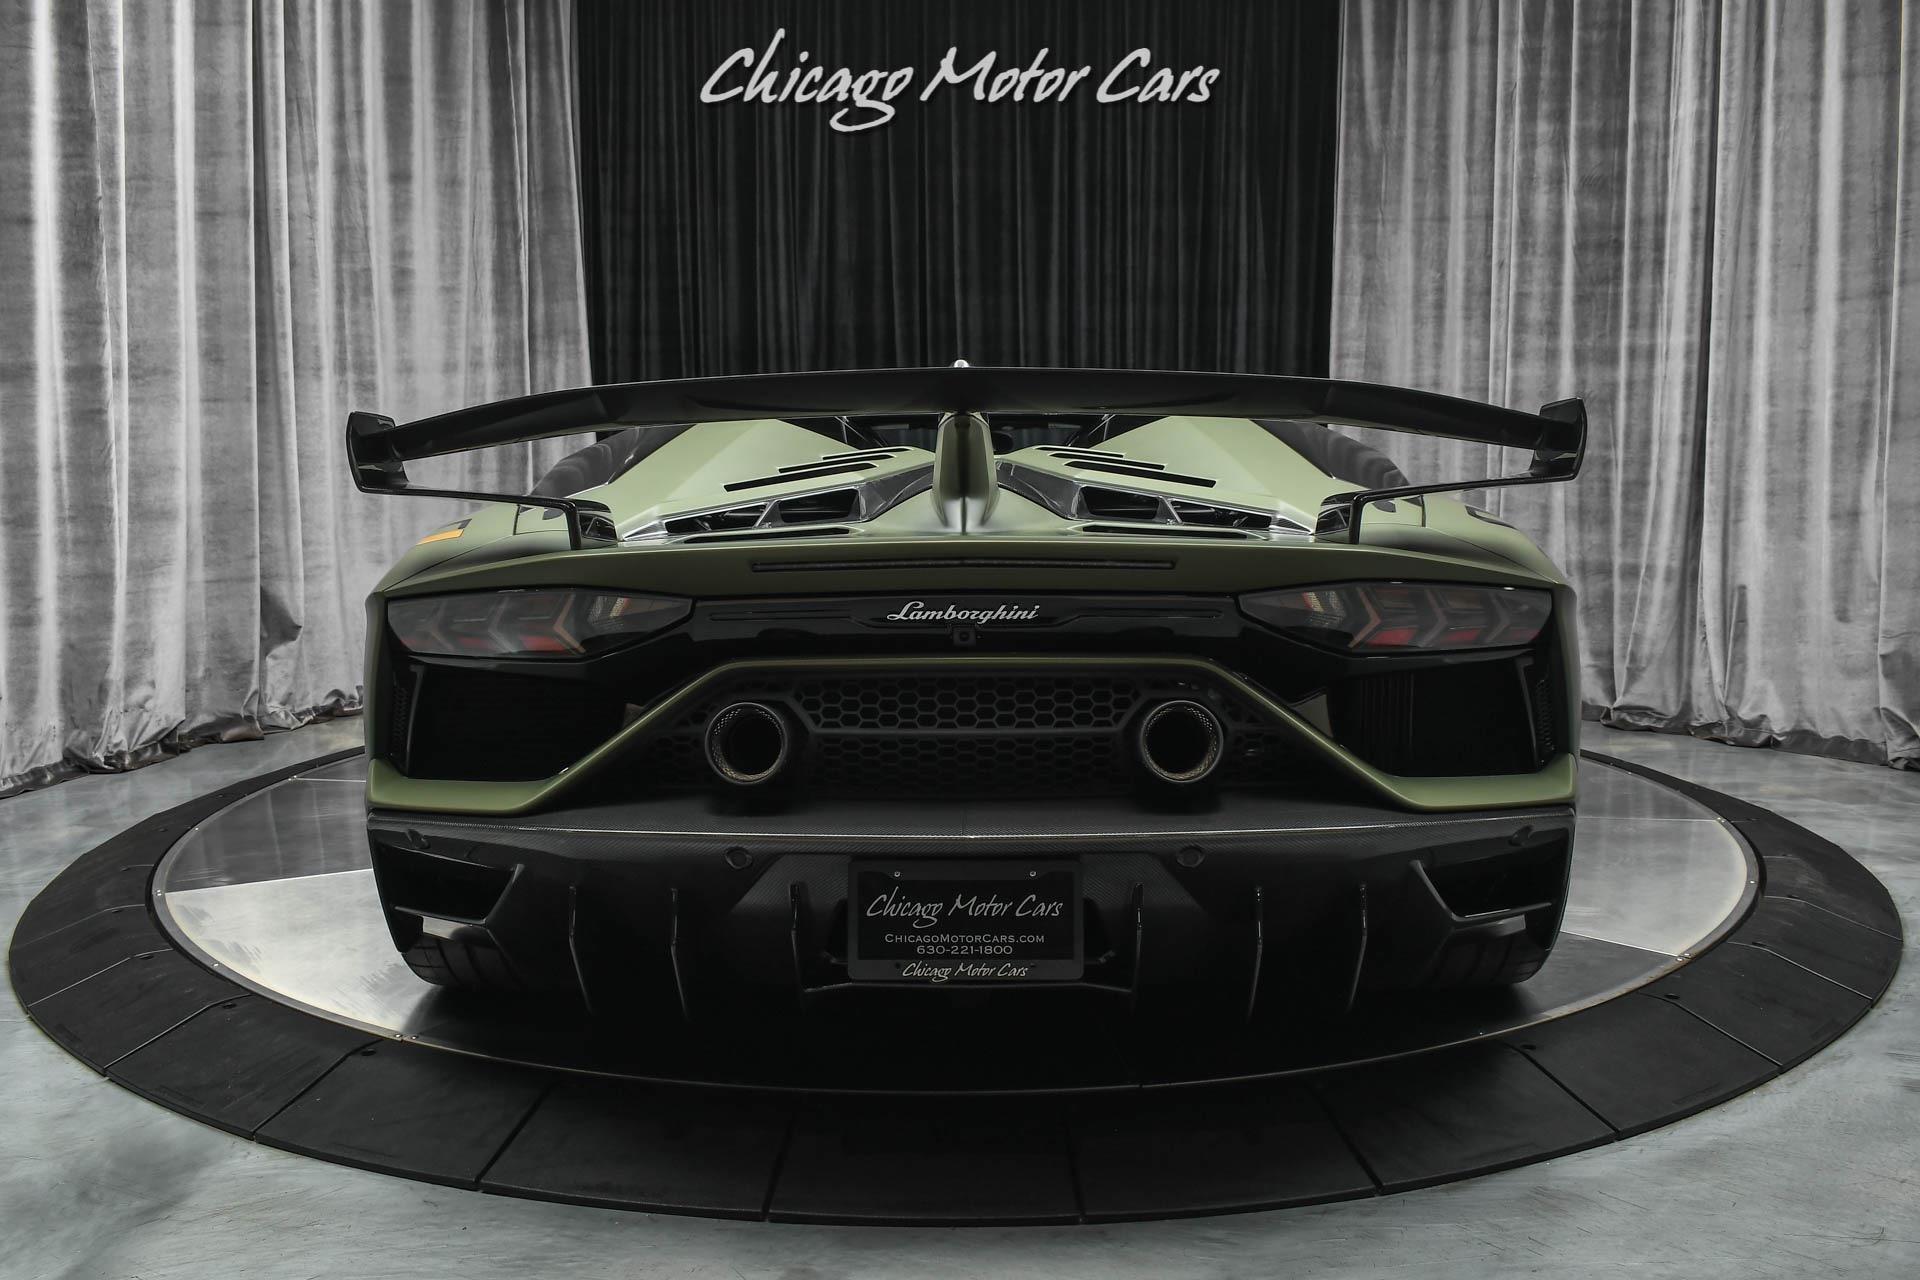 Used-2020-Lamborghini-Aventador-LP770-4-SVJ-Roadster-Factory-MATTE-Green-Carbon-Fiber-Everywhere